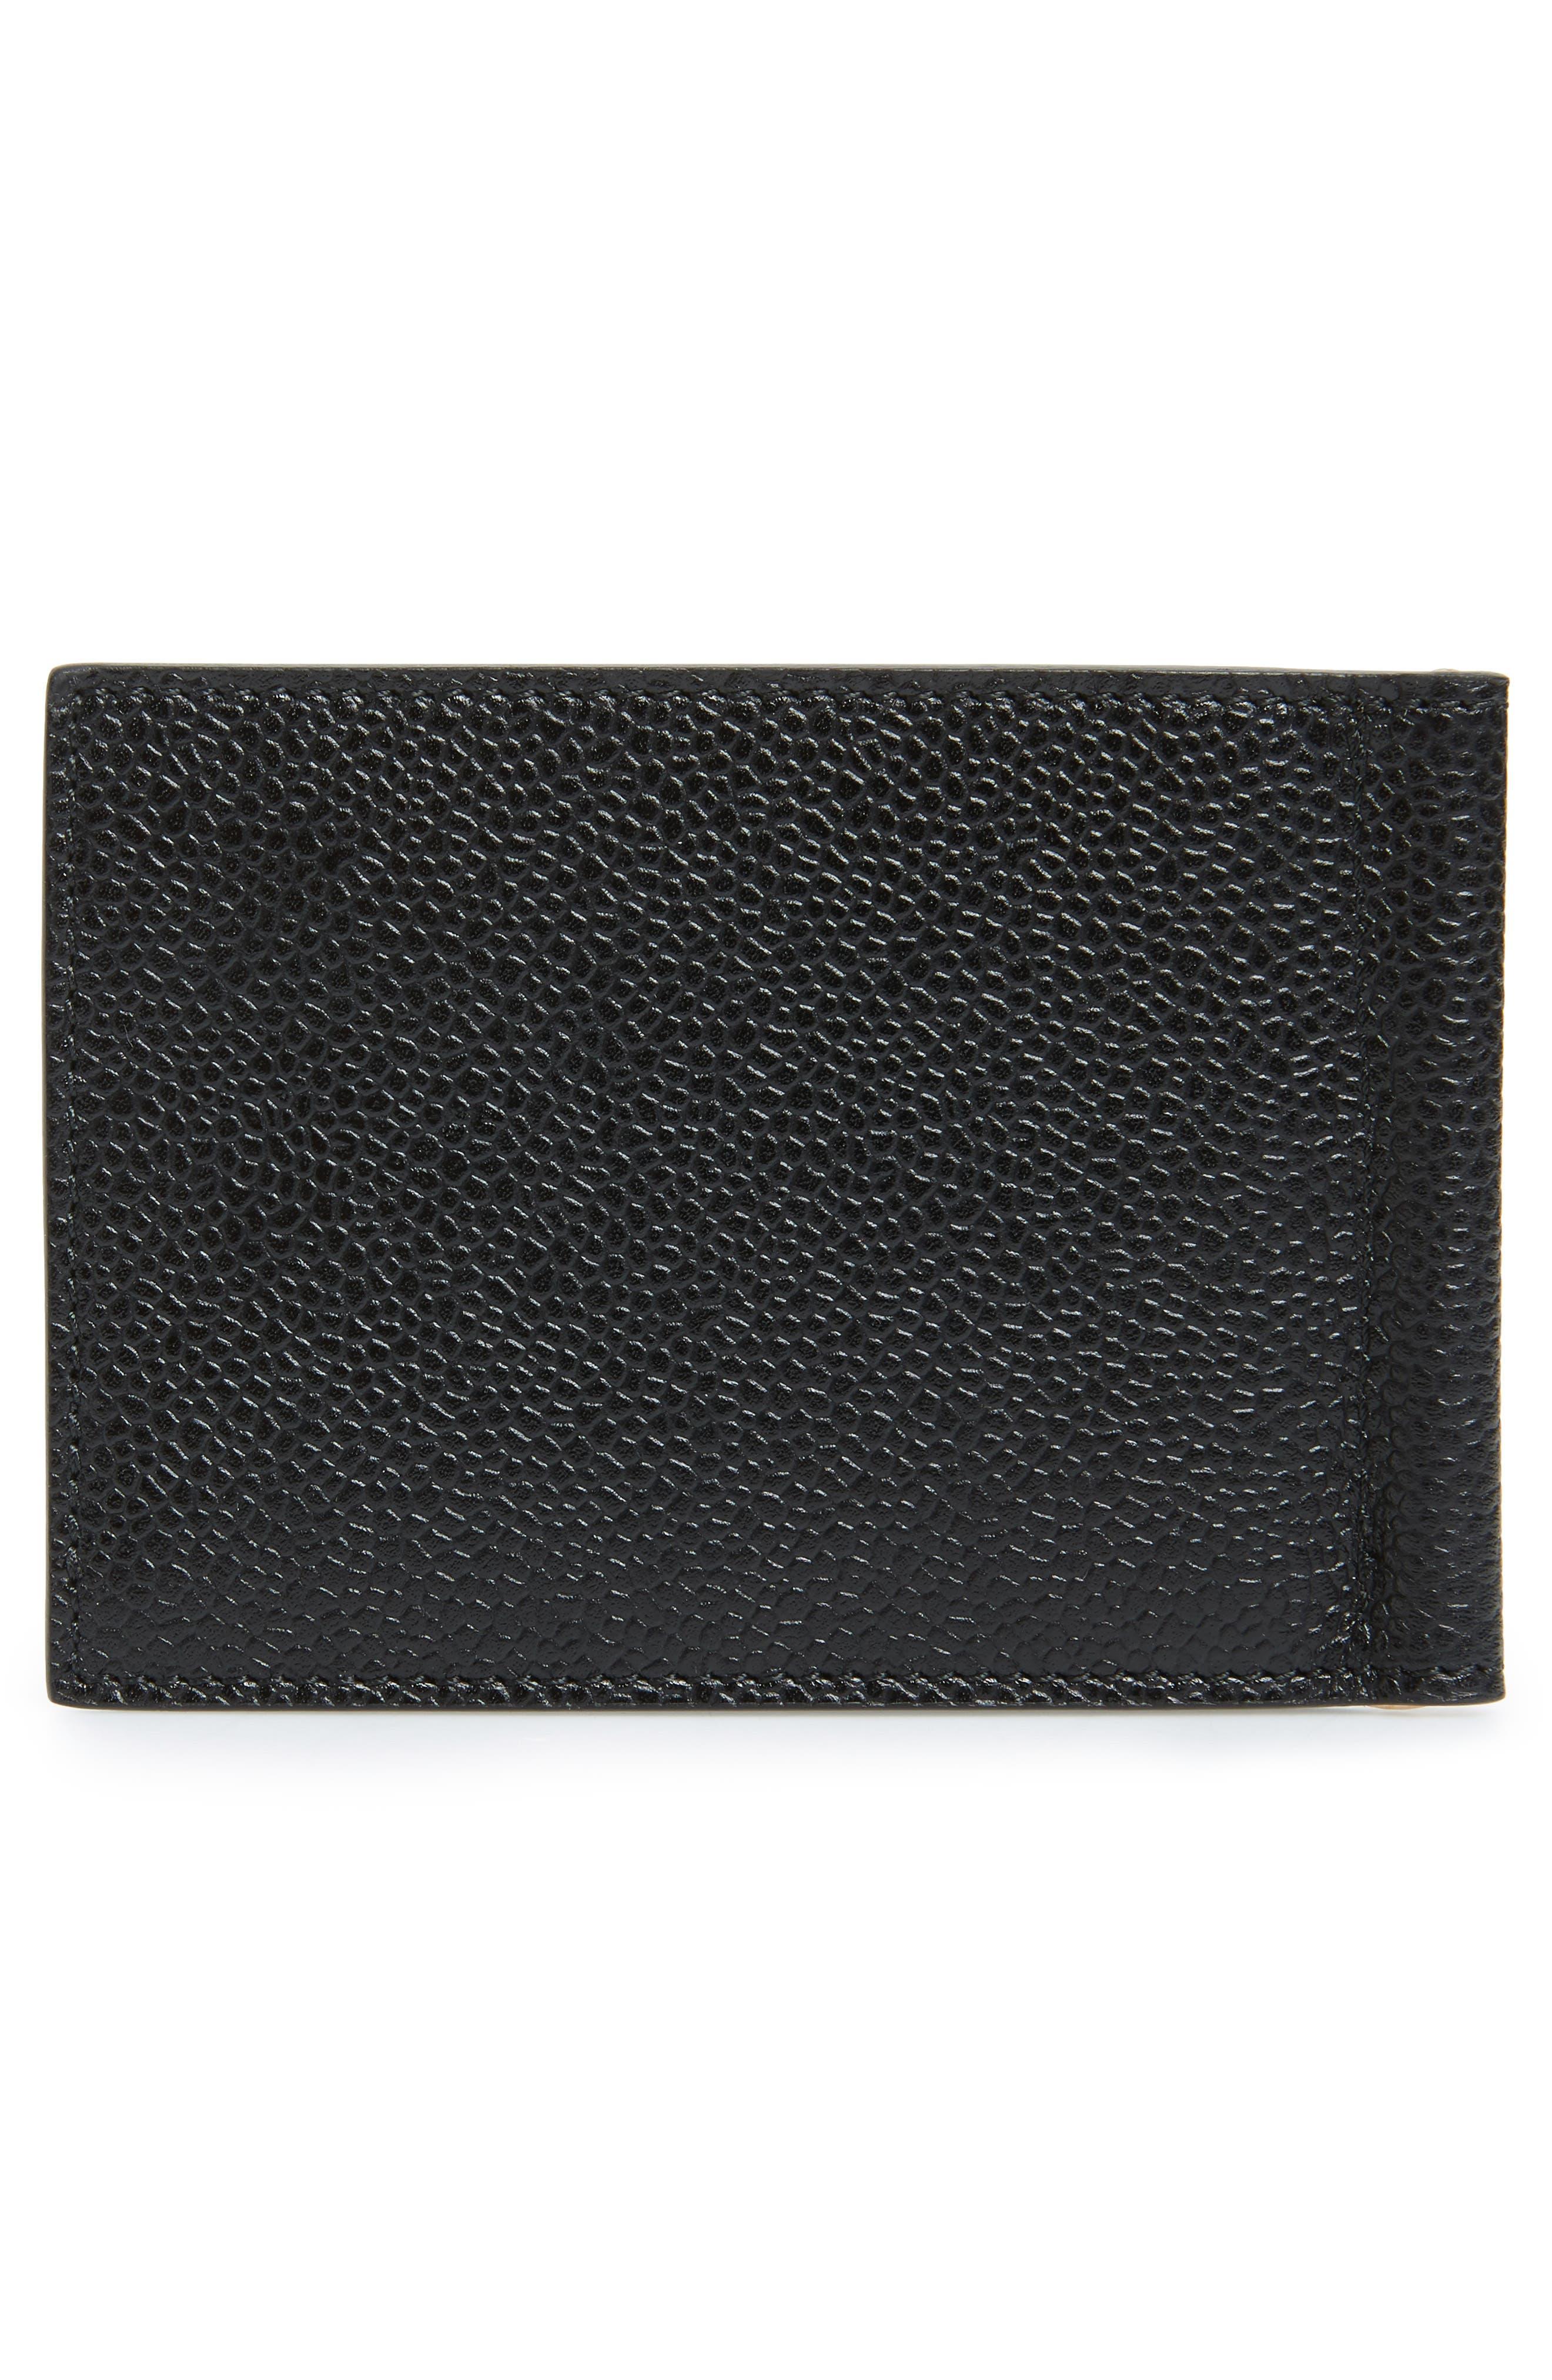 Alternate Image 3  - Thom Browne Diagonal Stripe Leather Card Holder